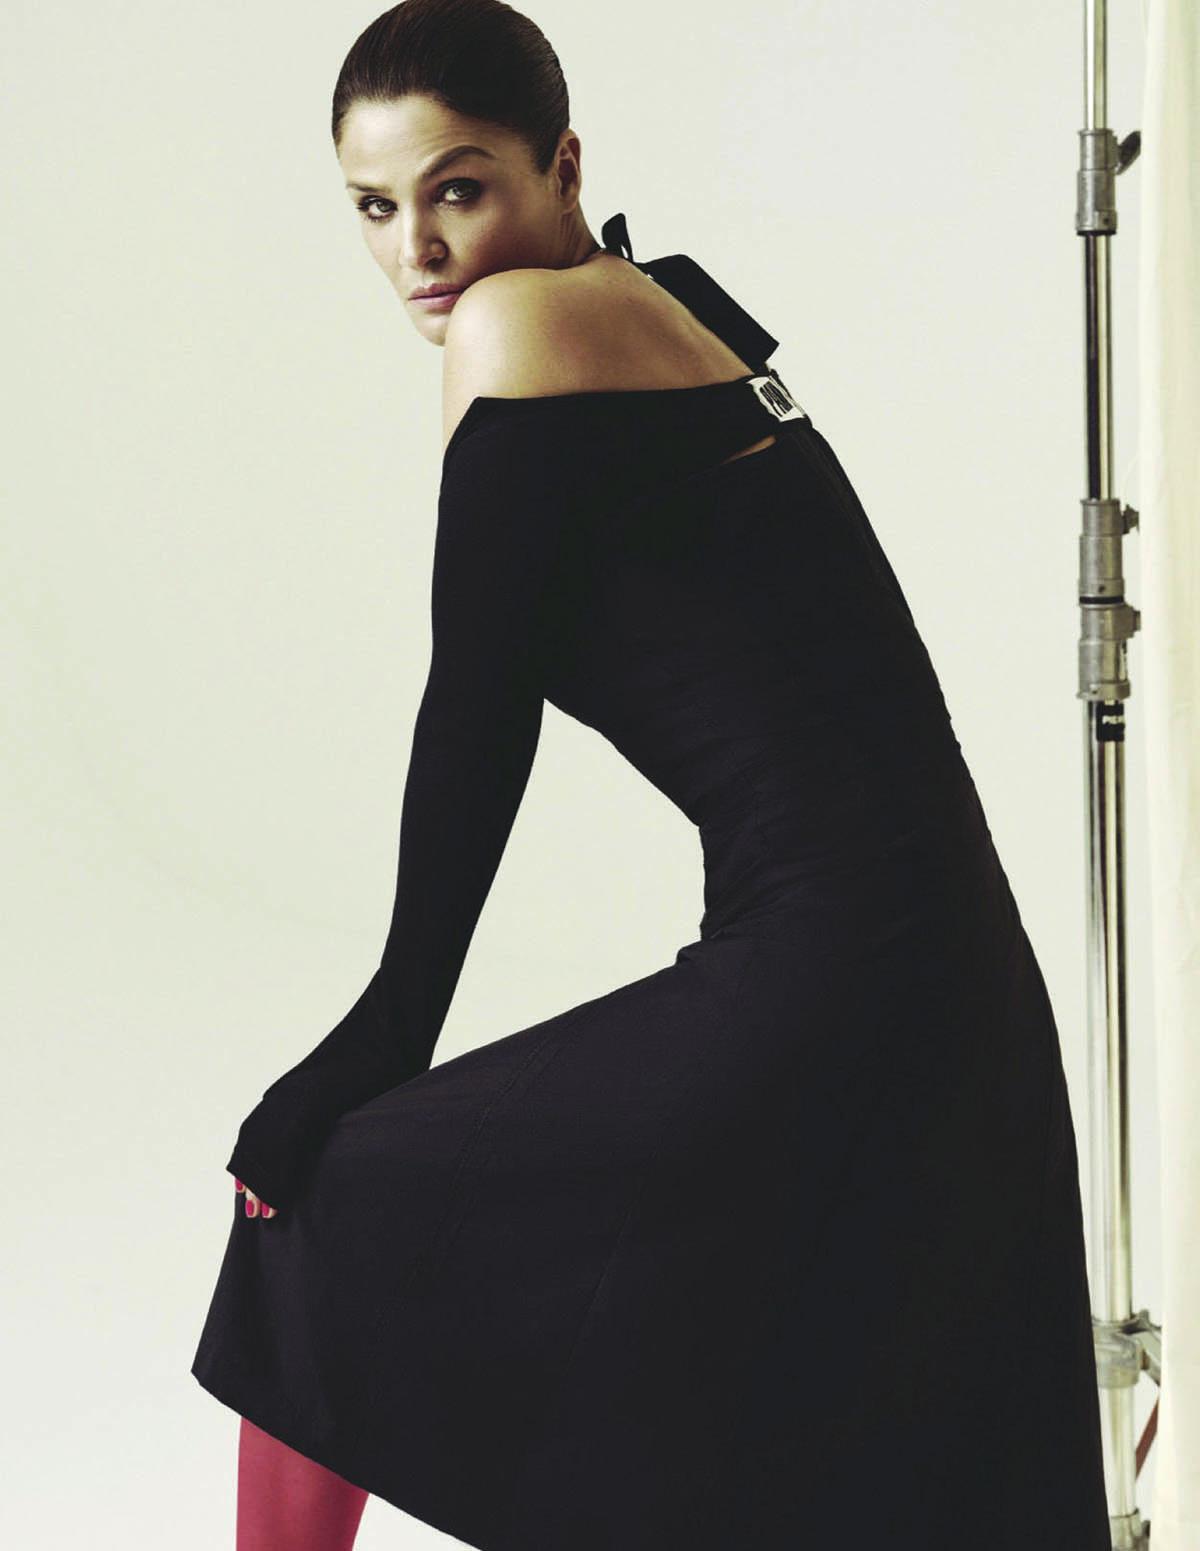 Helena Christensen covers Elle Russia February 2021 by Eduardo Rezende